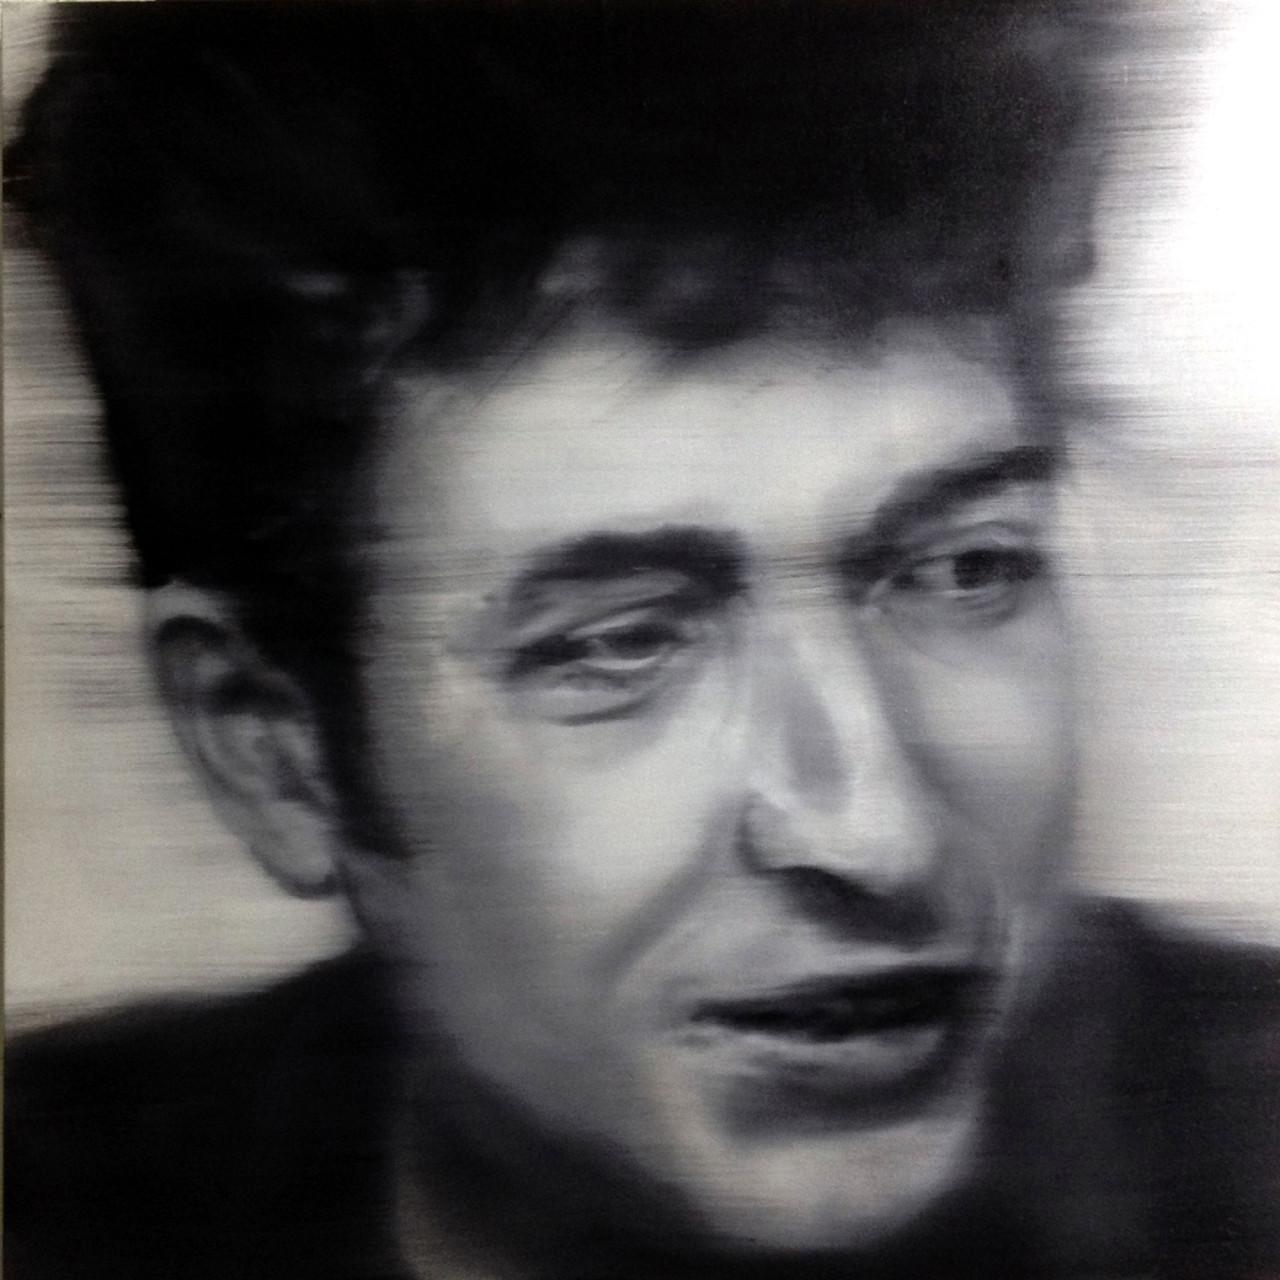 Omaggio a Bob Dylan, 2015, olio su tavola 85x85 cm